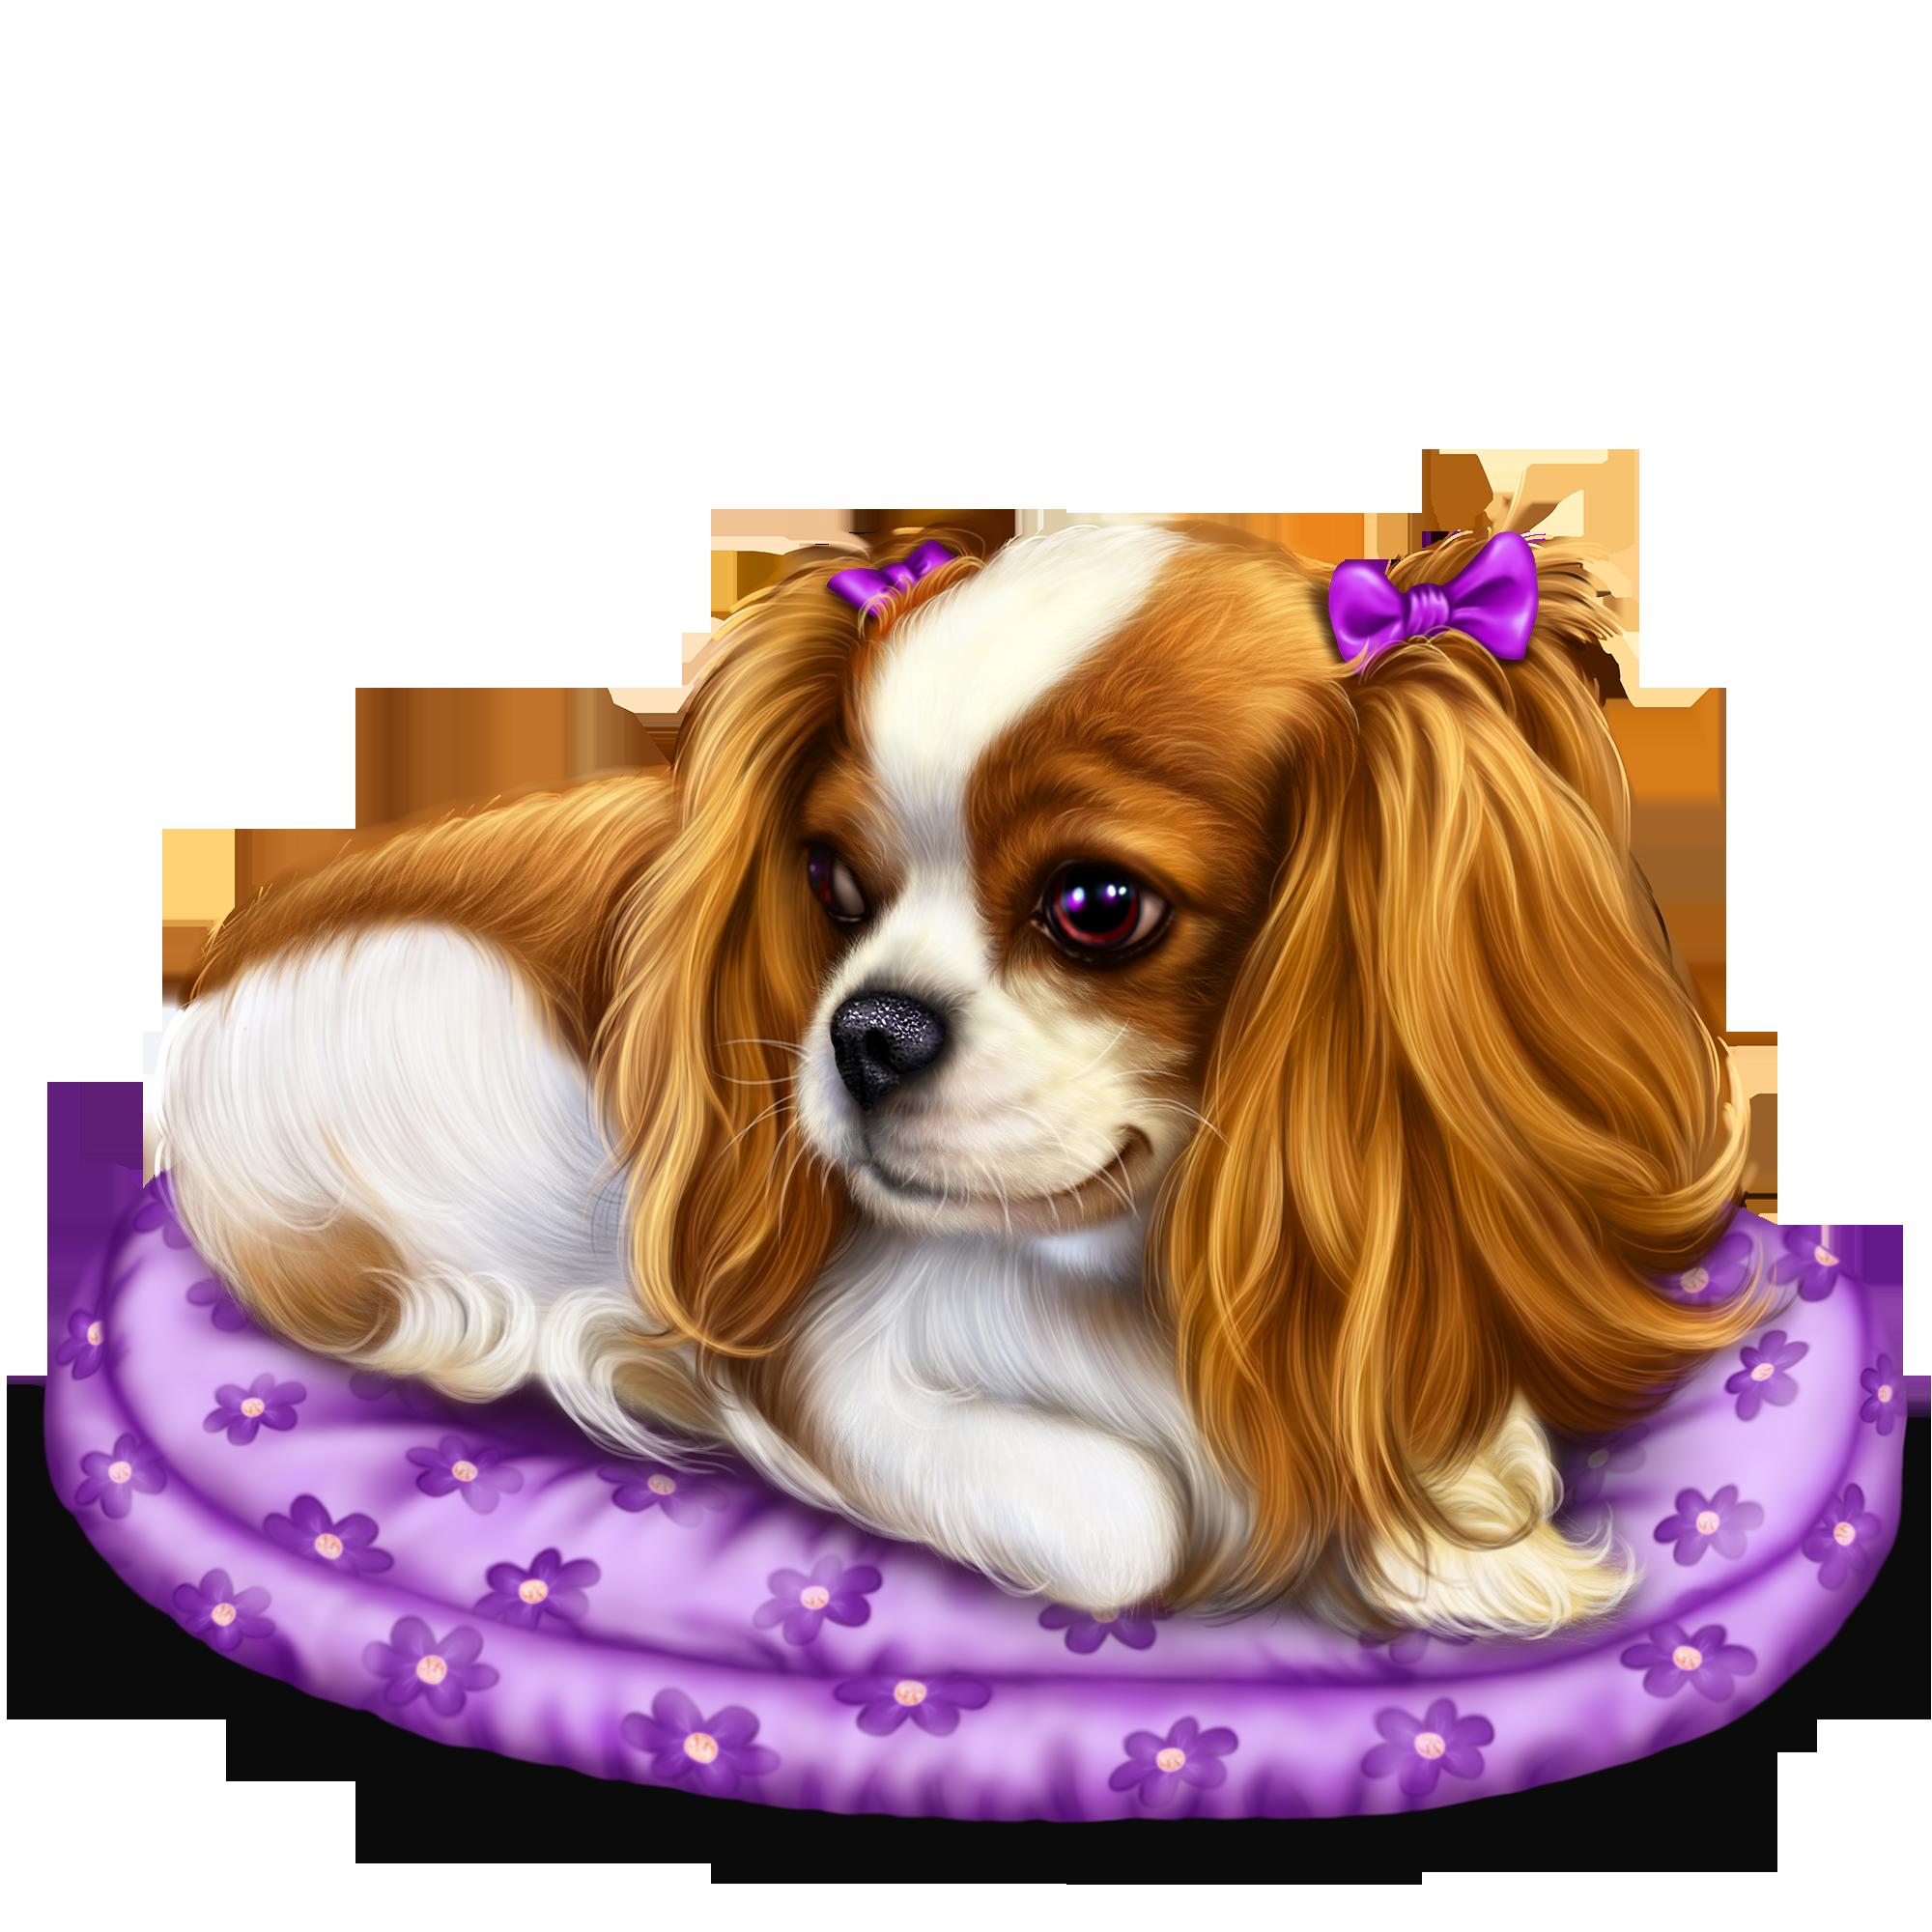 Pin By Corina Frezja On Pieski Dog Illustration Cavalier Dog Sweet Animals